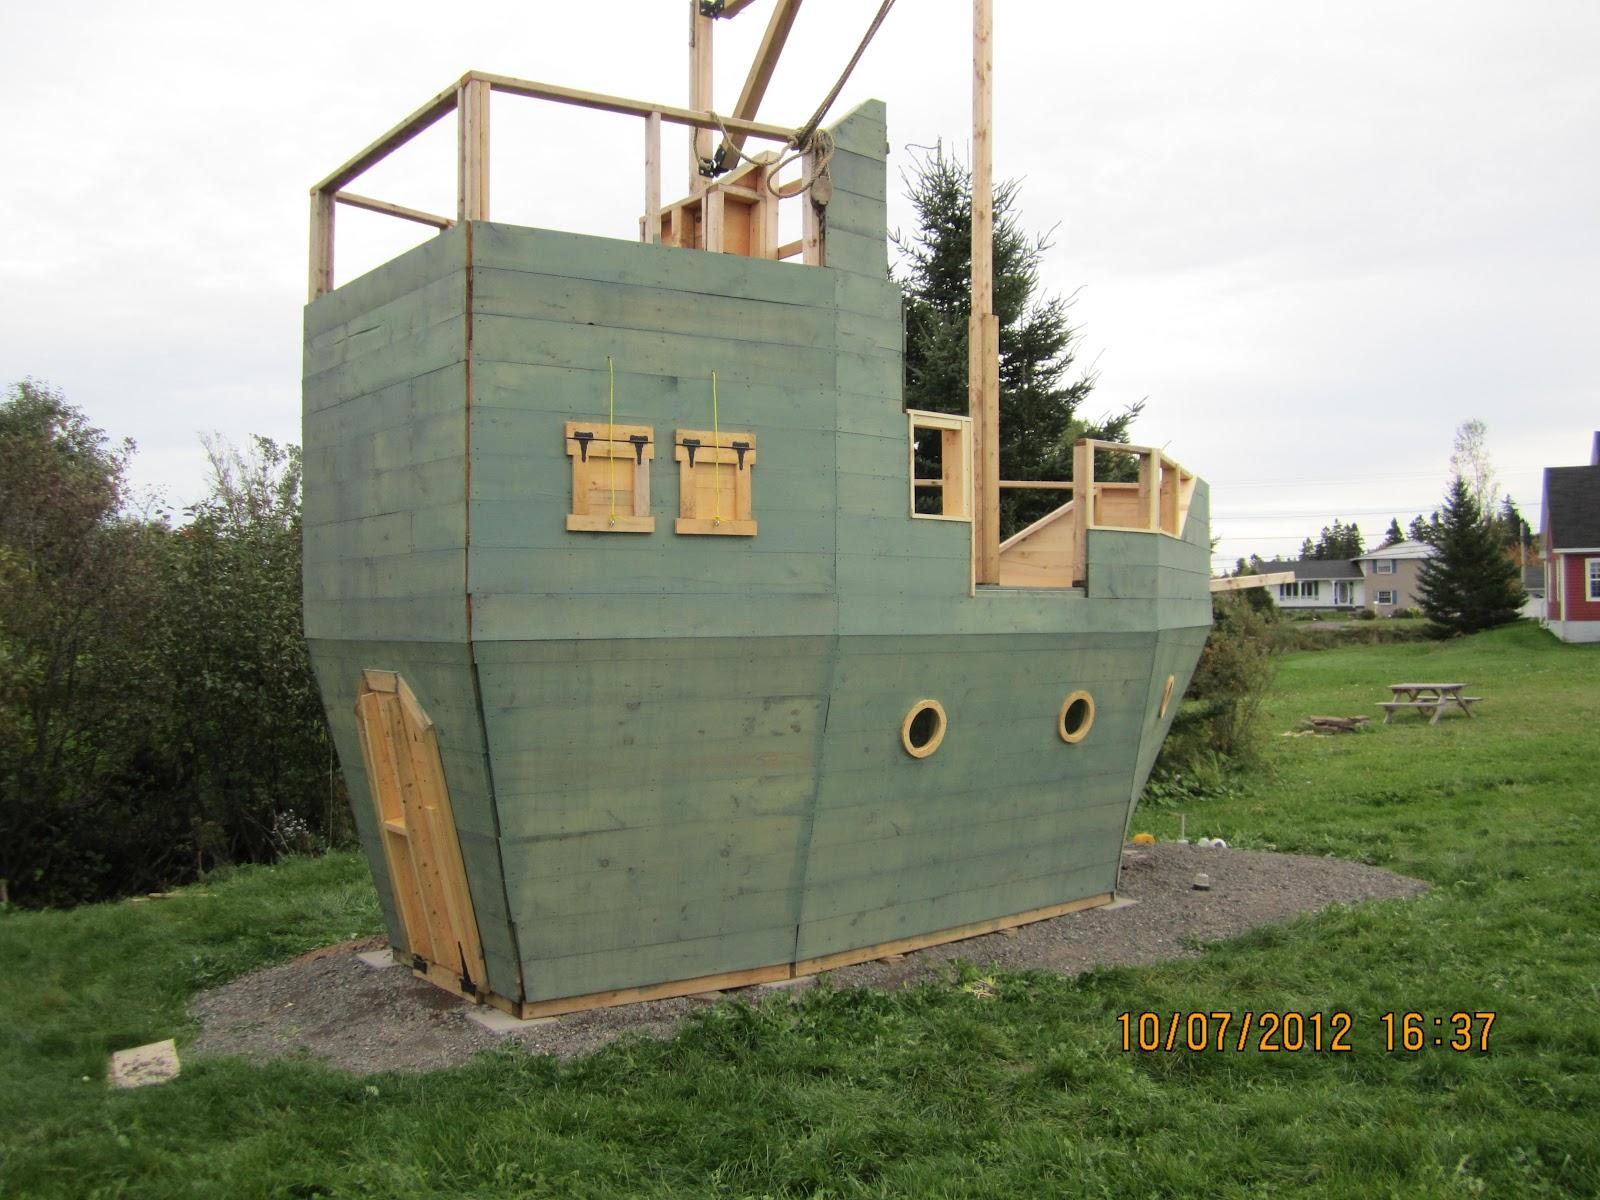 Backyard kidz backyard pirate ship playhouse the paint job for Boat playhouse plans